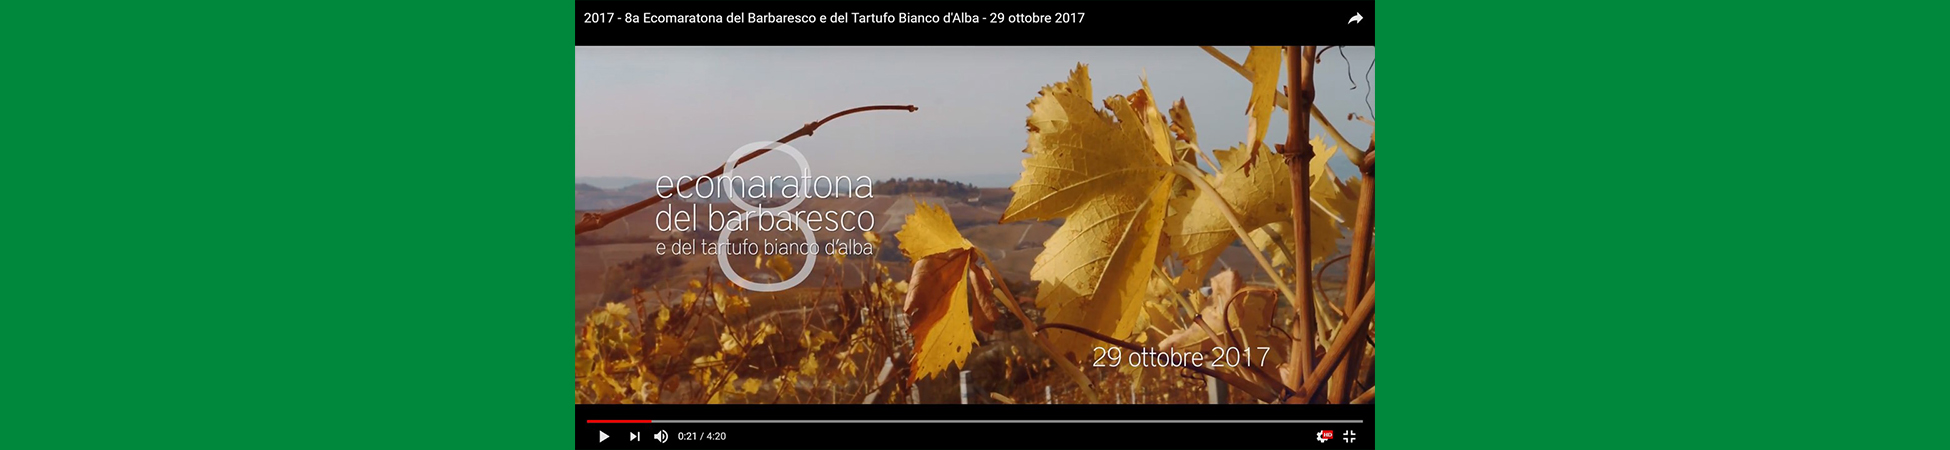 https://blog.triangolosport.it/wp-content/uploads/2017/11/Per-immagine-in-evidenza.jpg